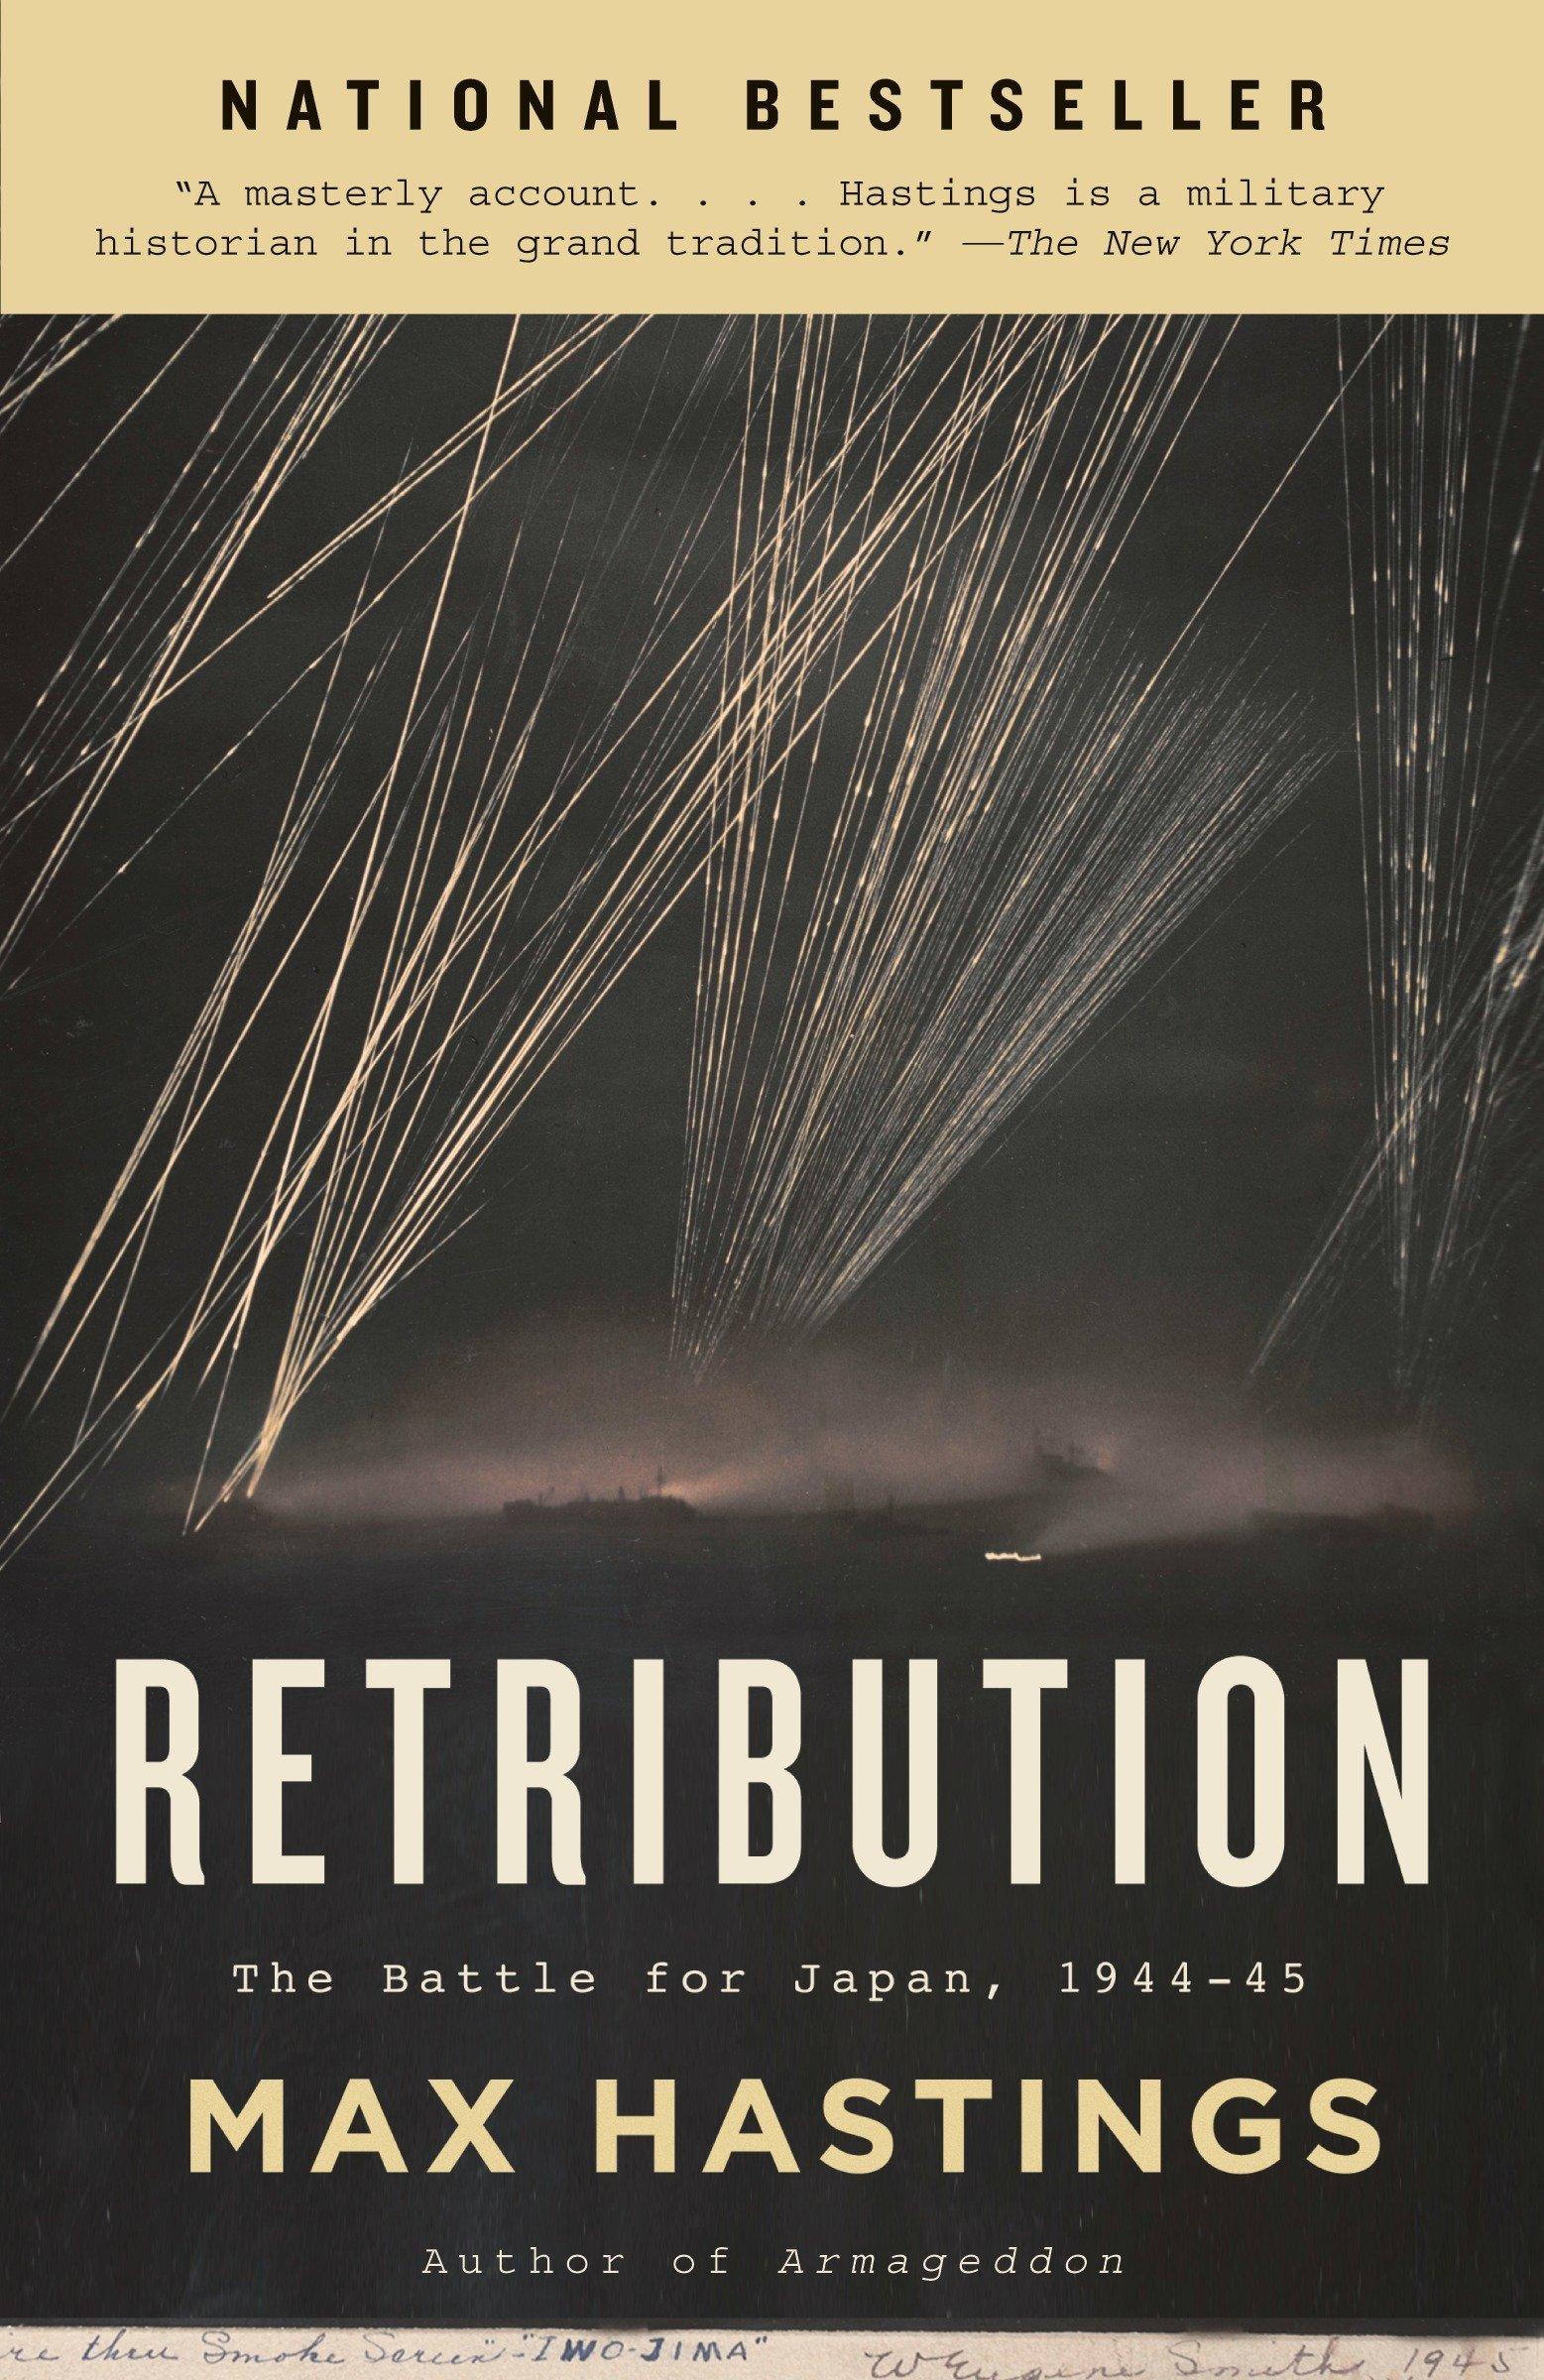 Download Retribution: The Battle for Japan, 1944-45 PDF